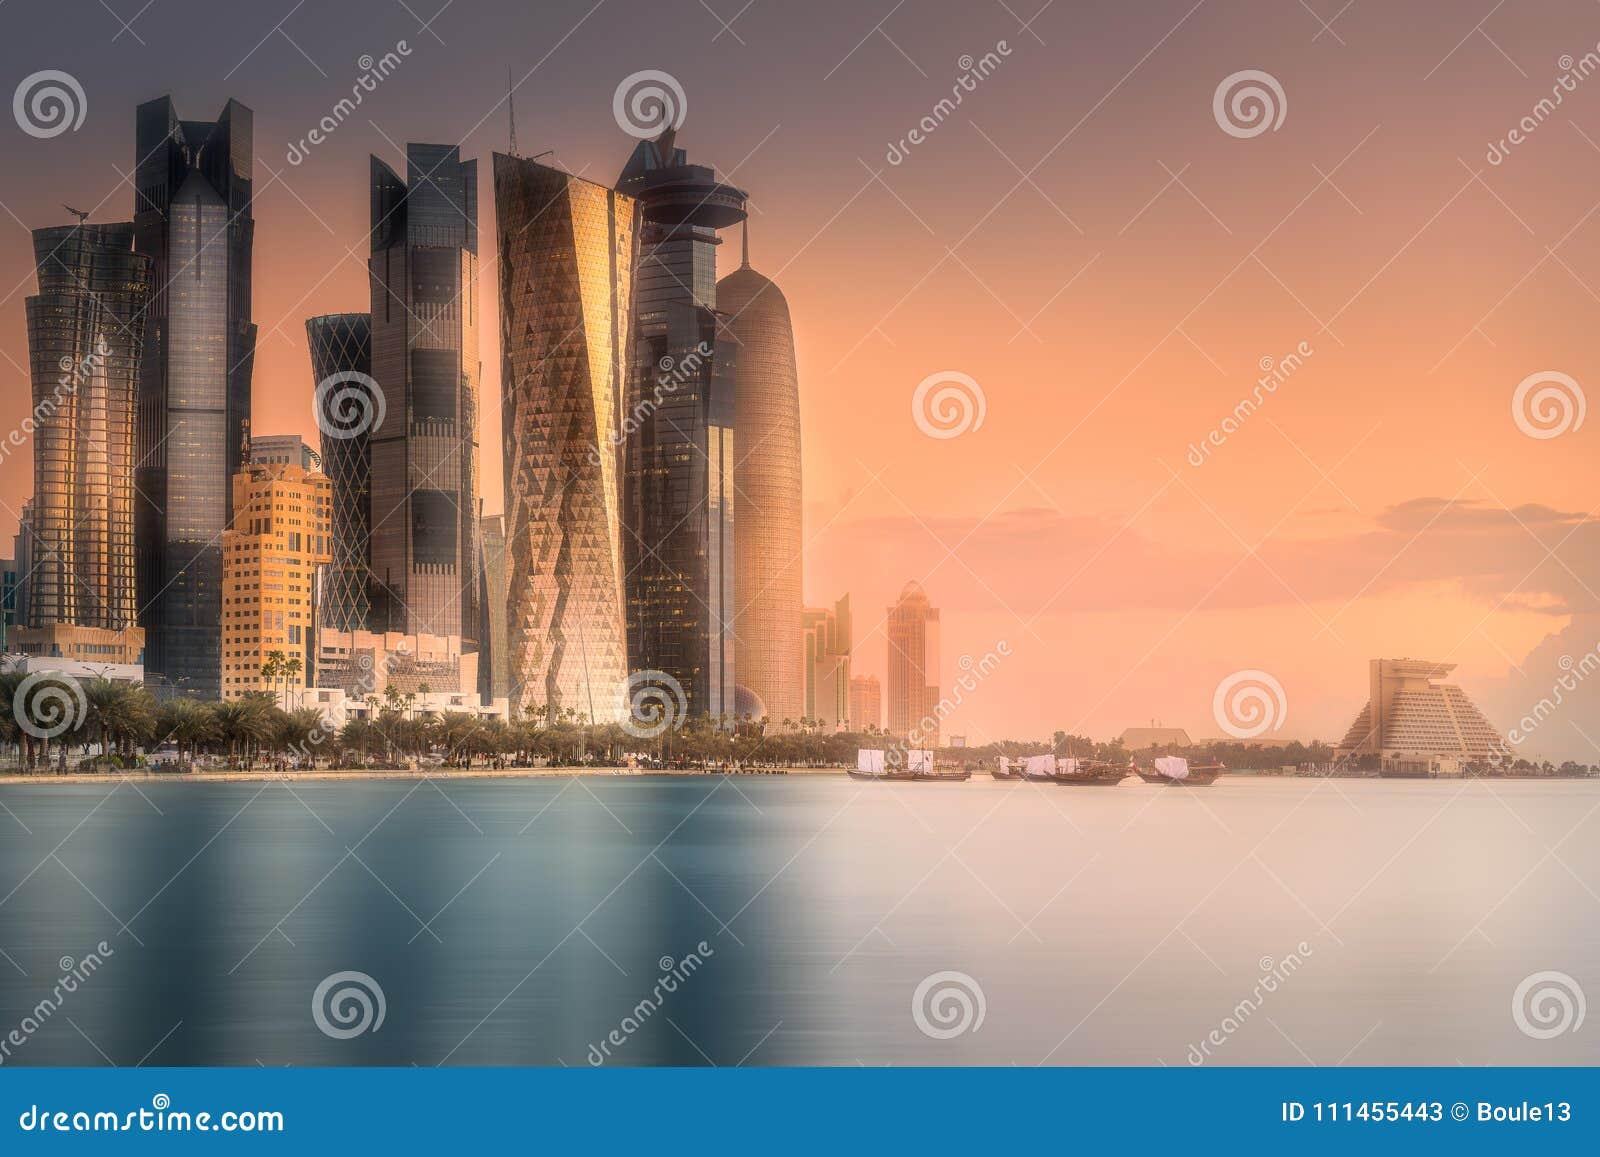 Skyline of West Bay and Doha City Center, Qatar